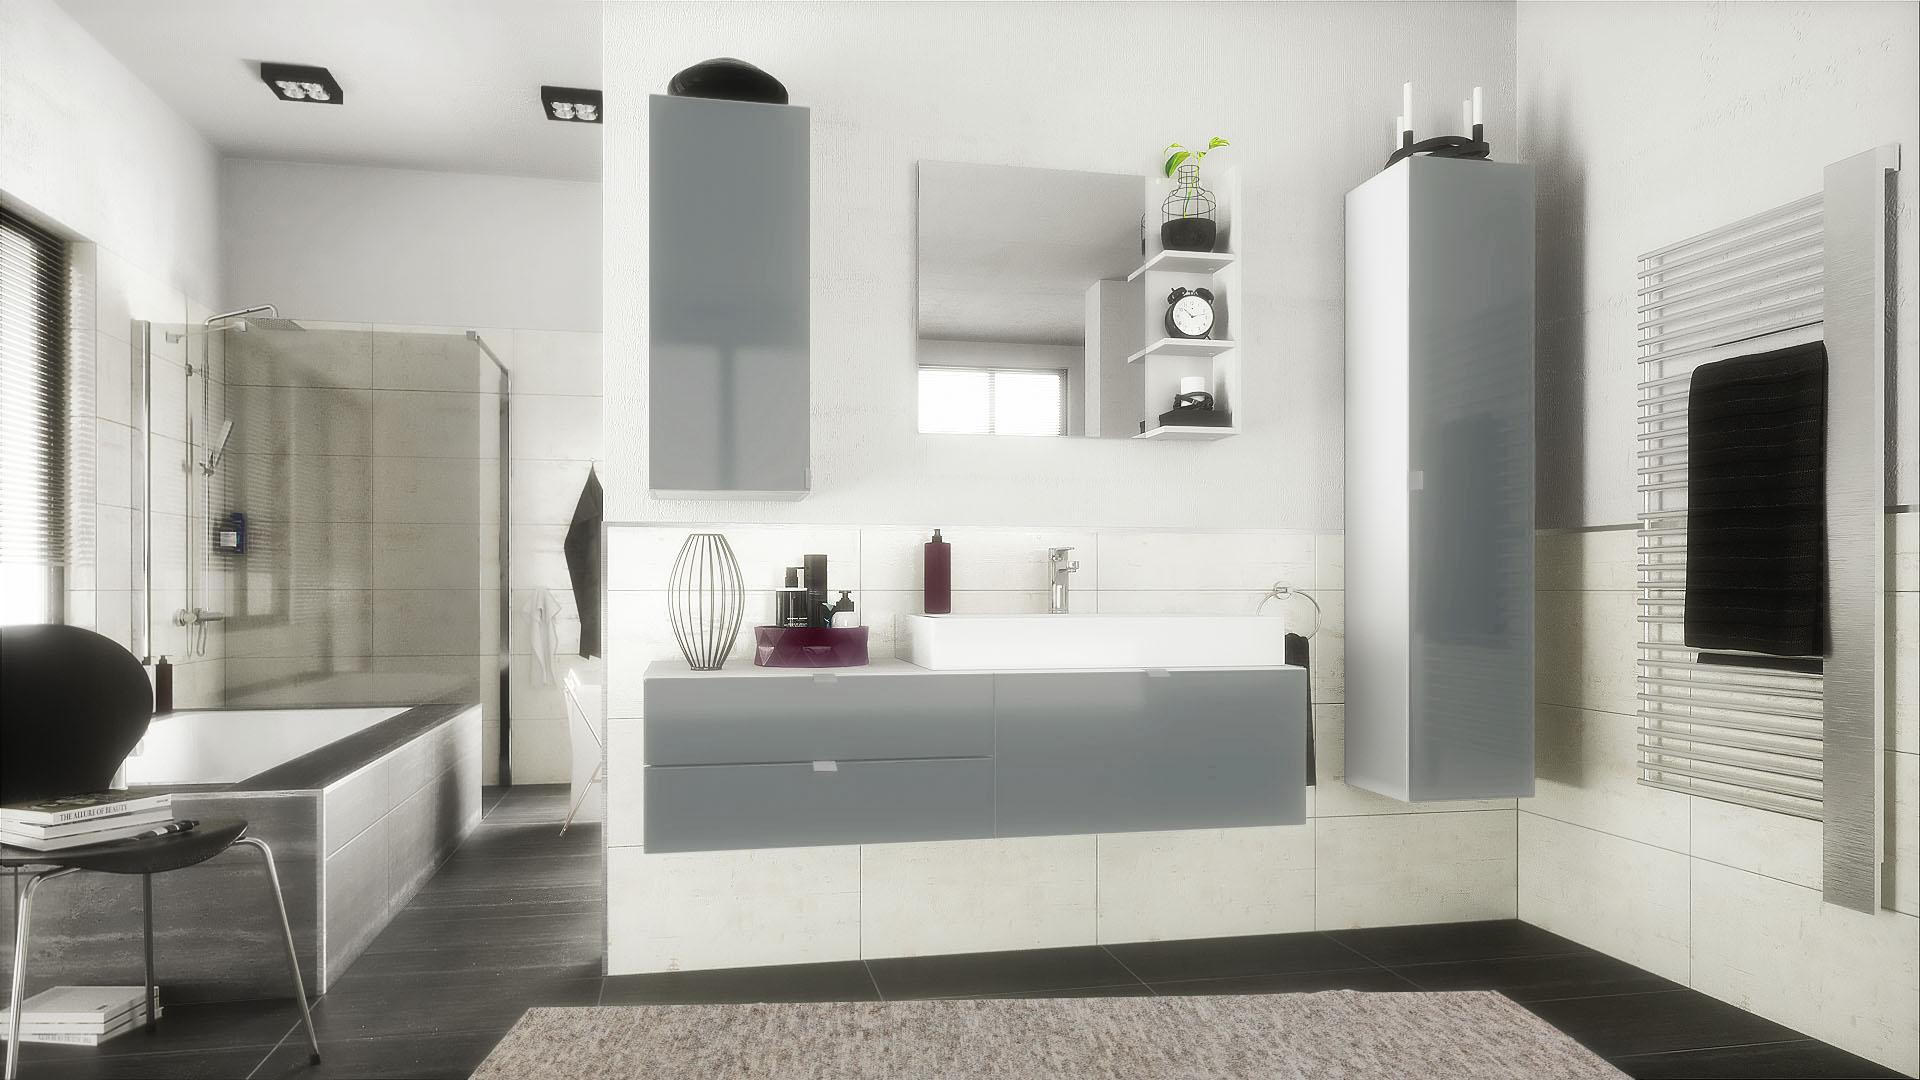 badezimmer set wei hochglanz h ngeschrank unterschrank. Black Bedroom Furniture Sets. Home Design Ideas